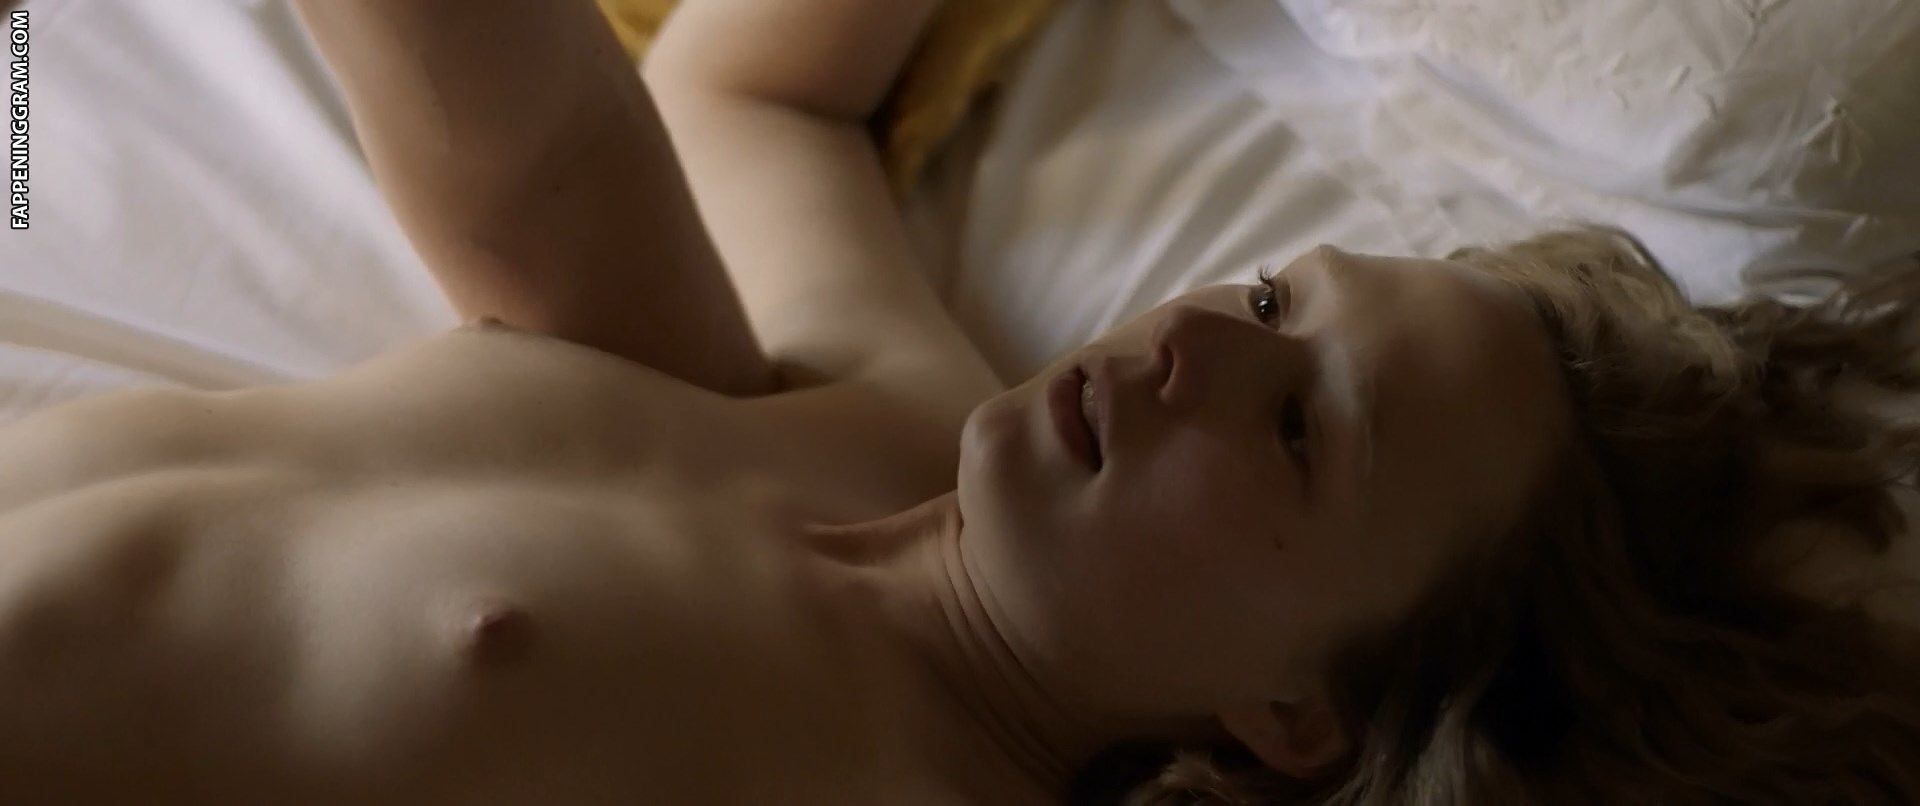 Alba Galindo Nude Pics Pics, Sex Tape Ancensored